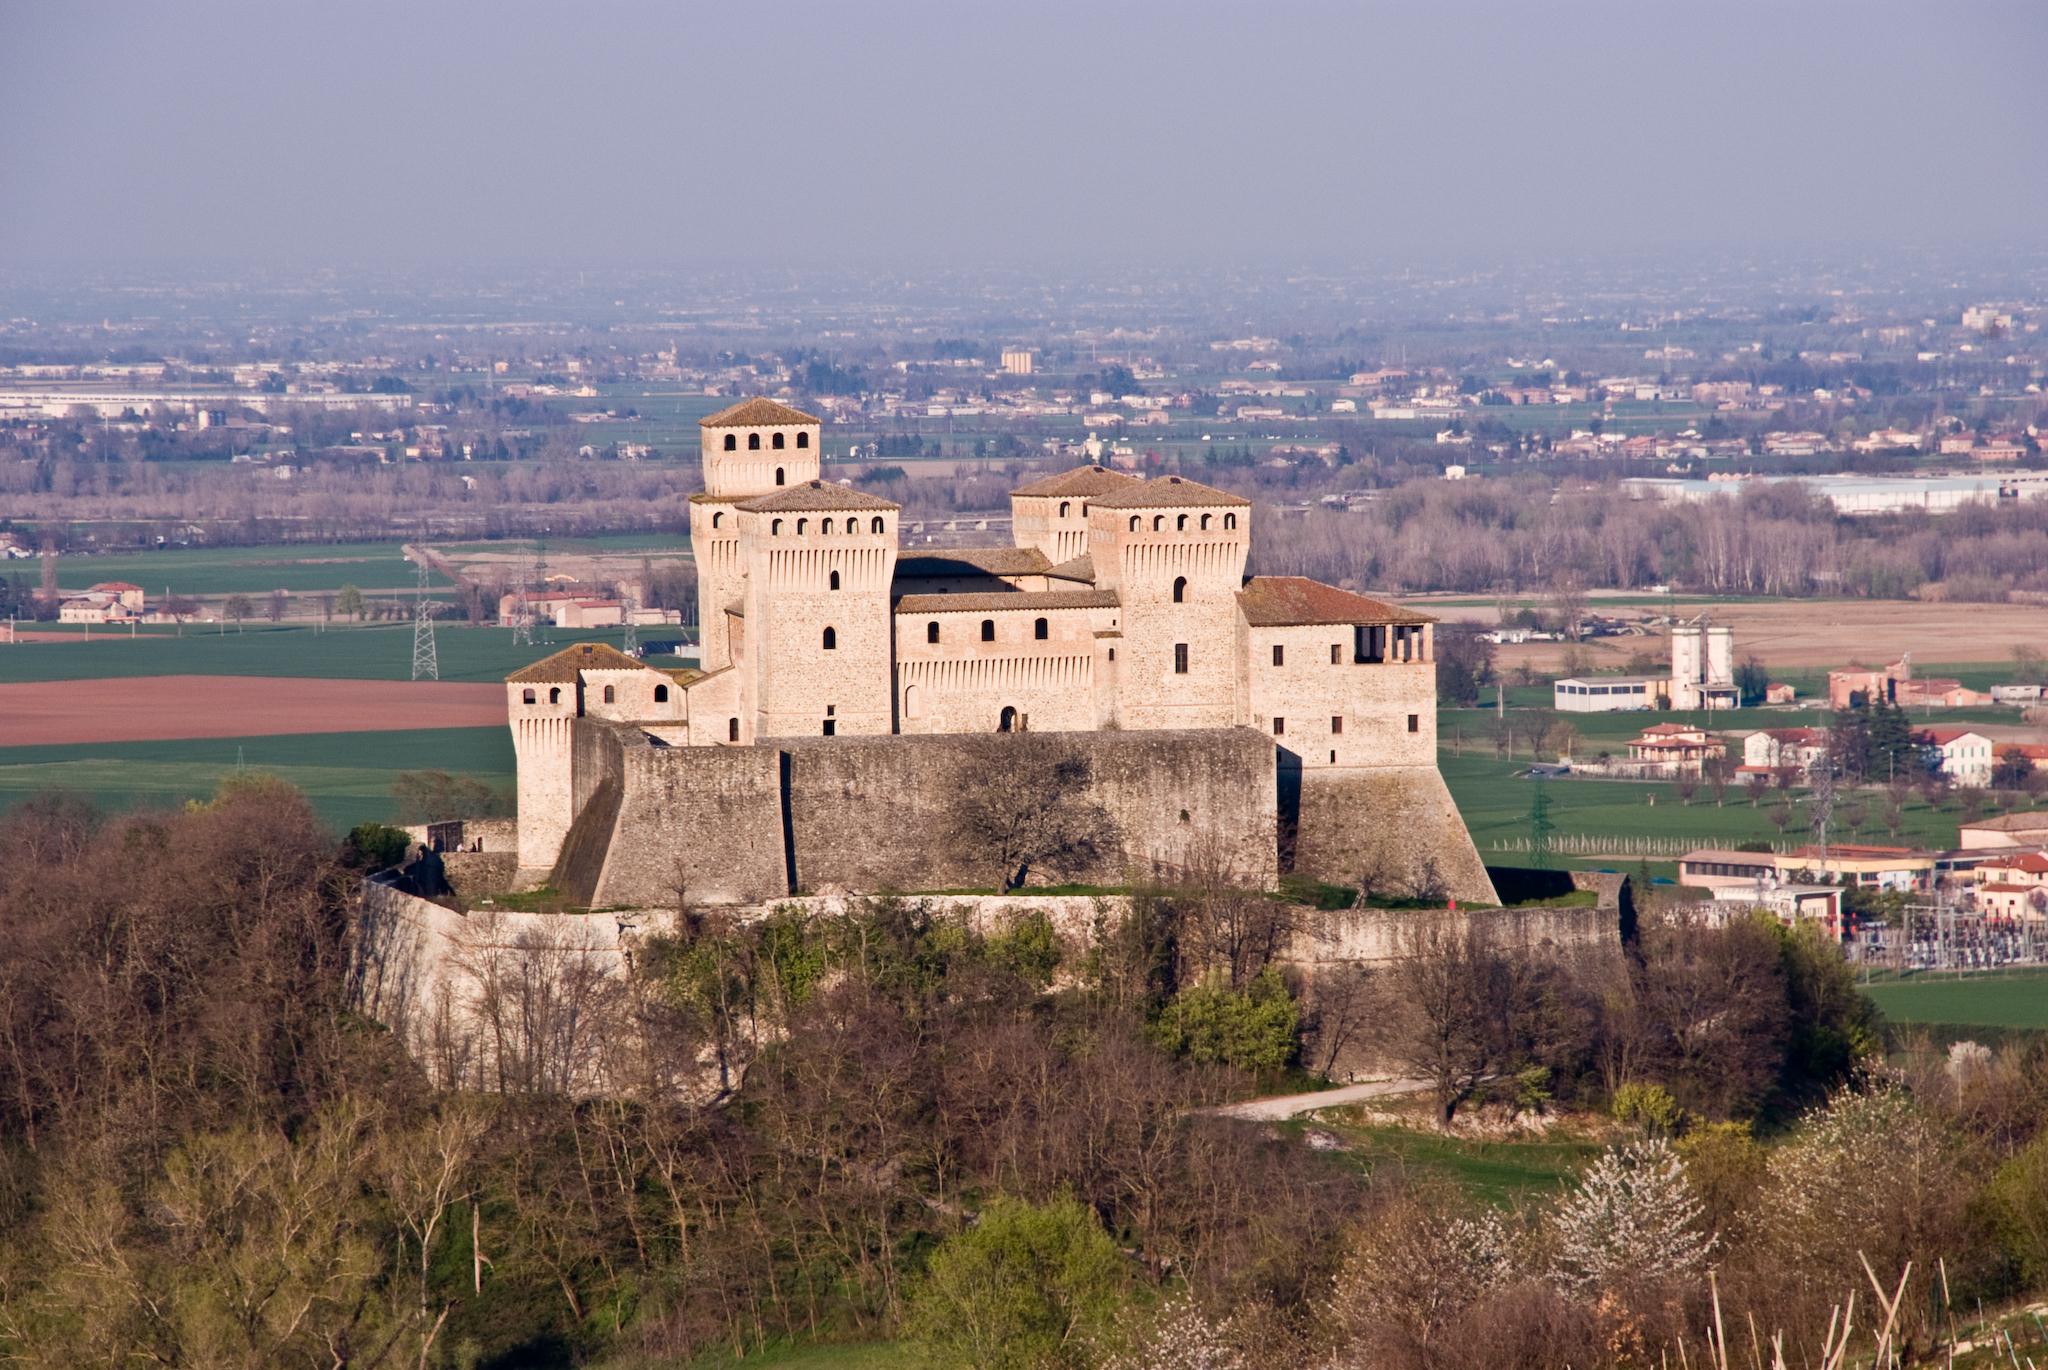 File:Torrechiara - Castello.JPG - Wikimedia Commons